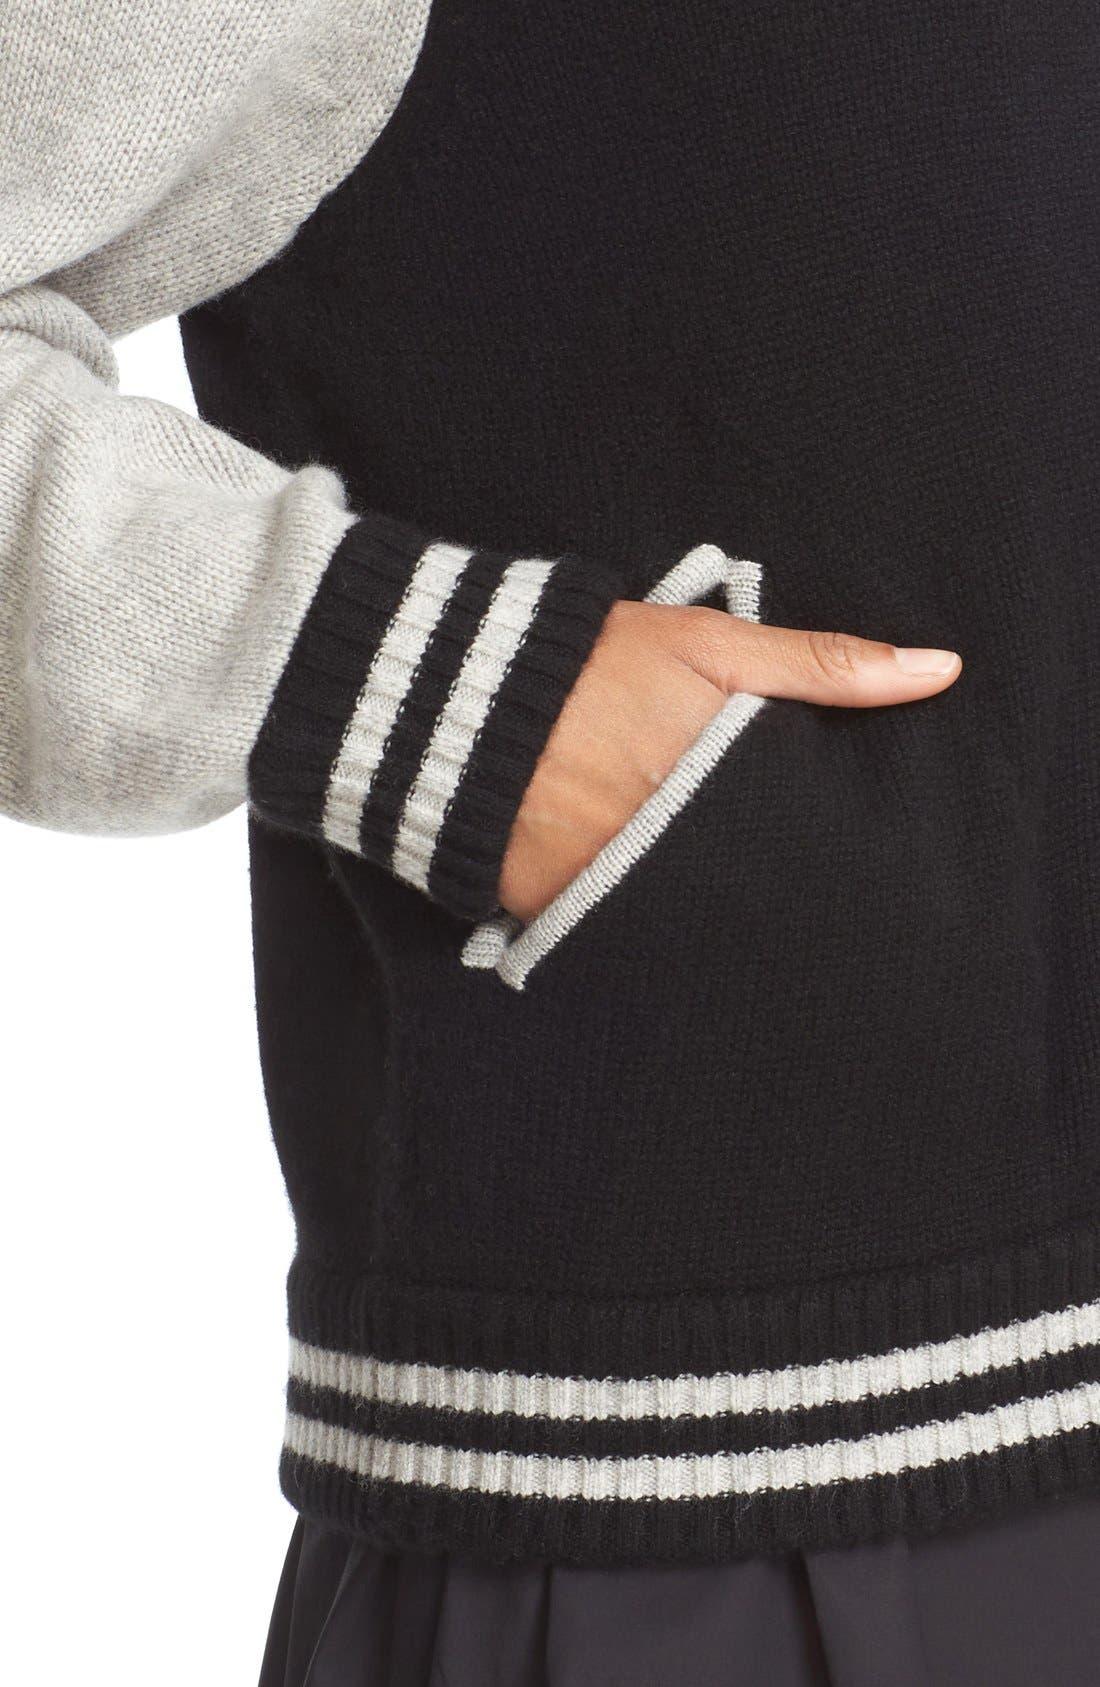 Stripe Detail Wool & Cashmere Knit Varsity Jacket,                             Alternate thumbnail 7, color,                             Black